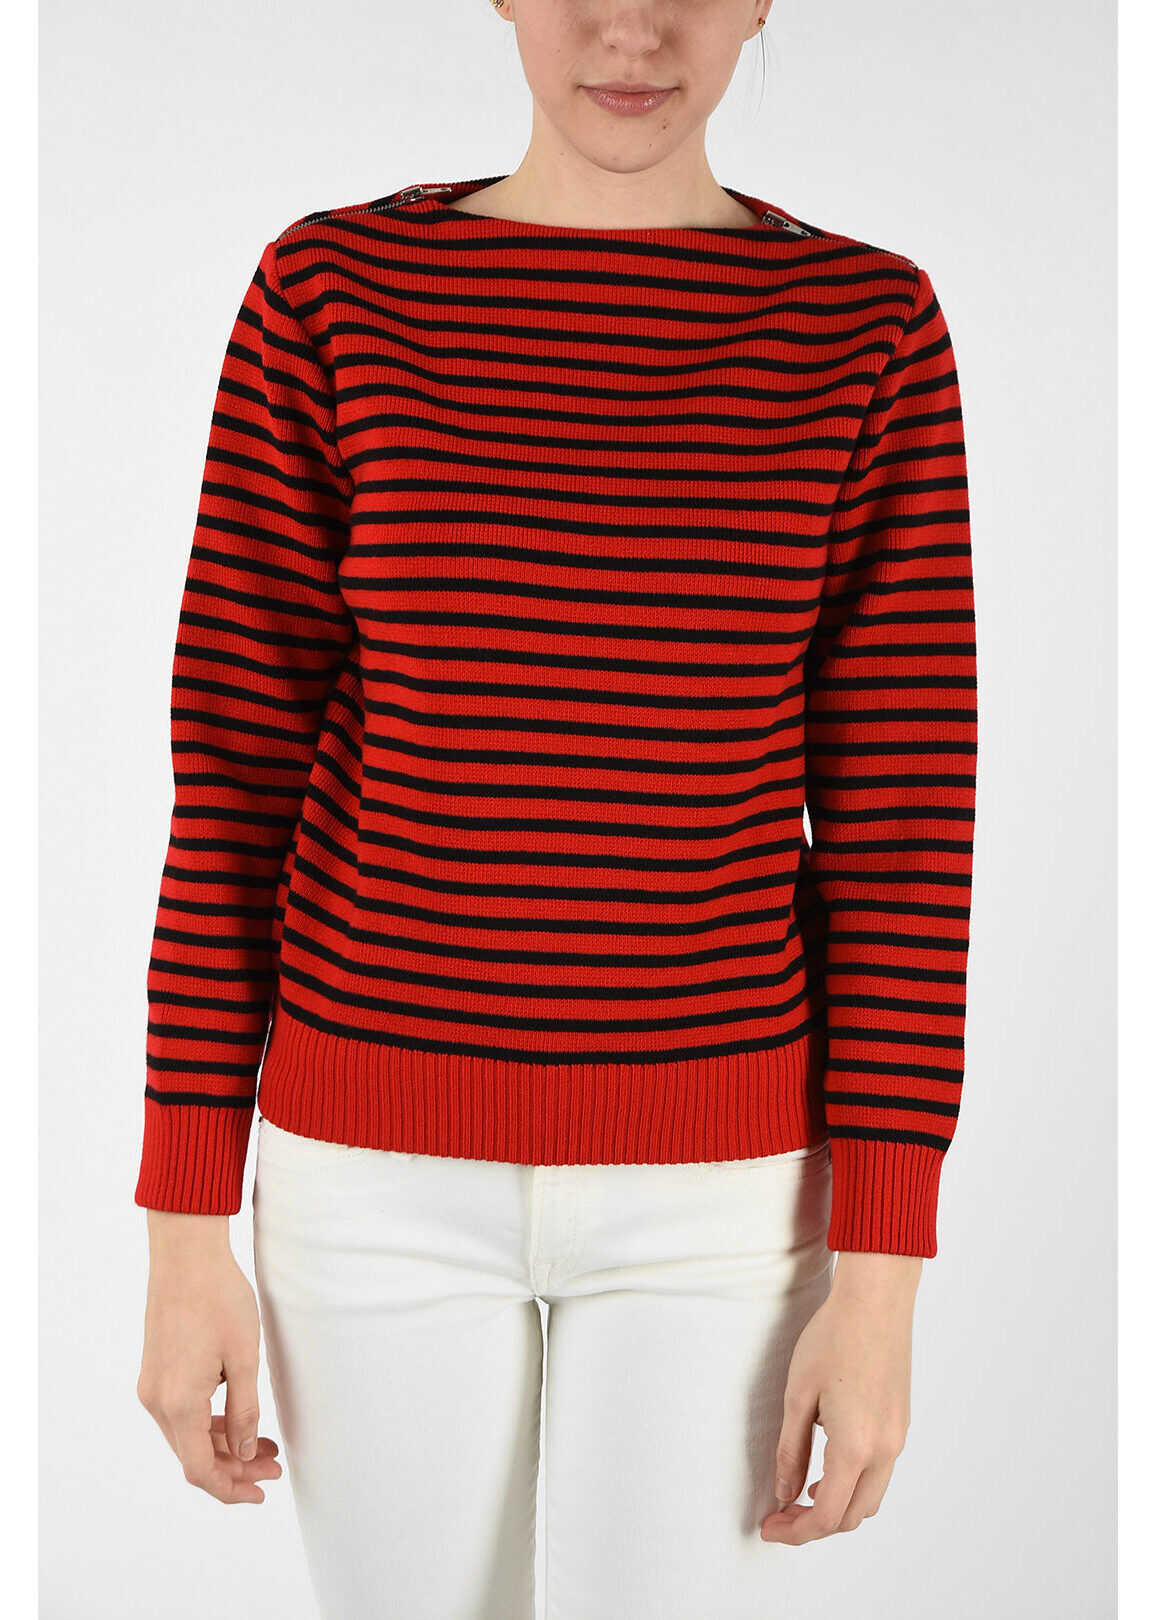 Céline wool striped sweater BLACK